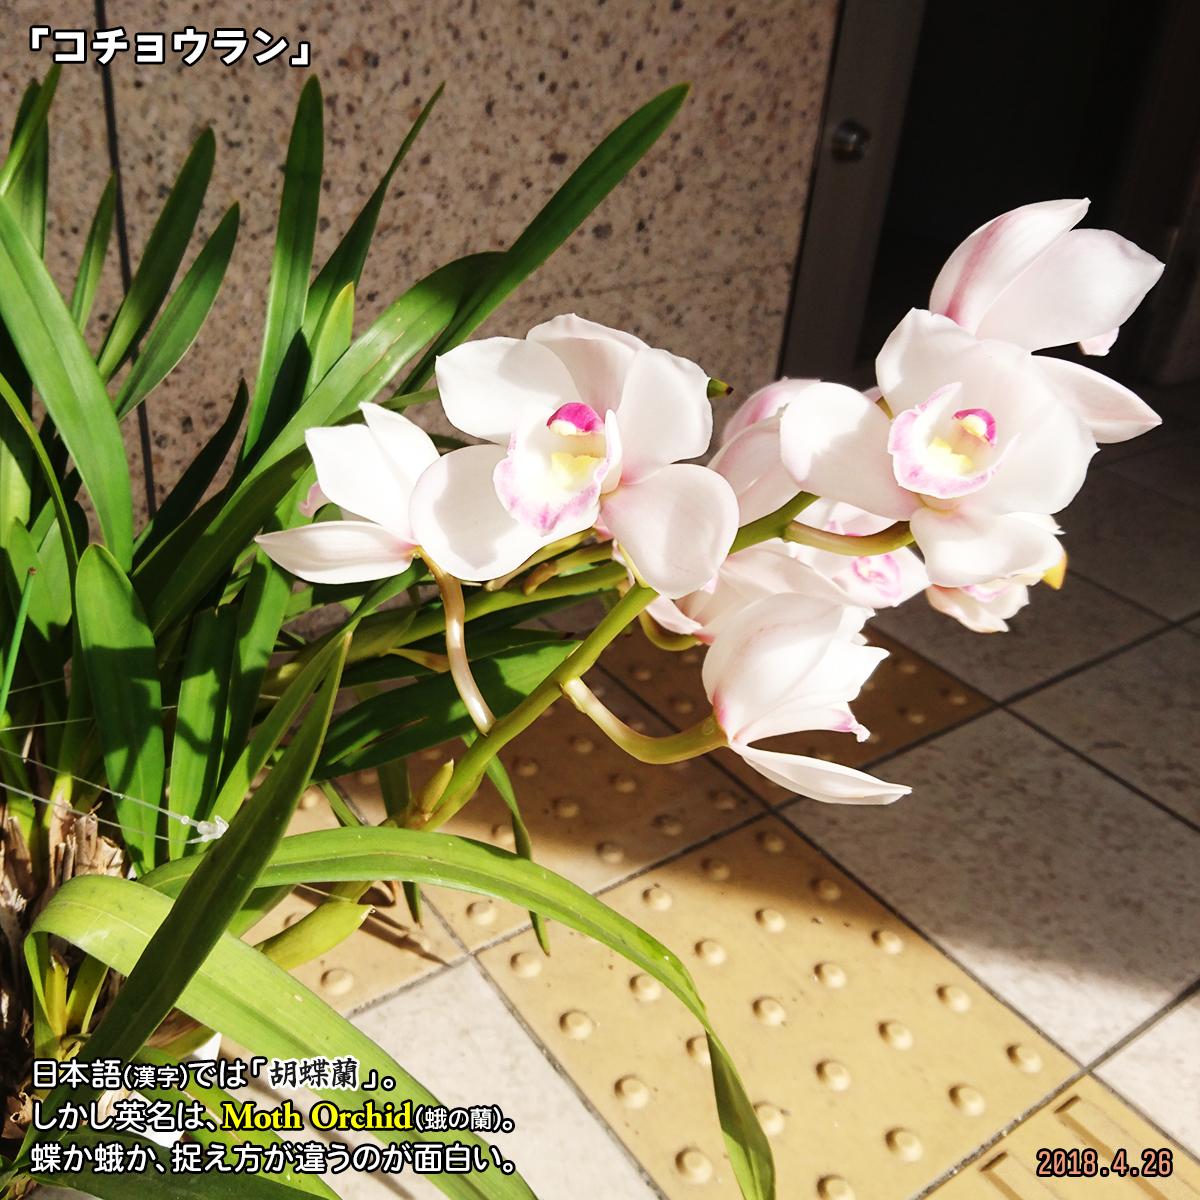 DSC_7169_20200311173215557.jpg